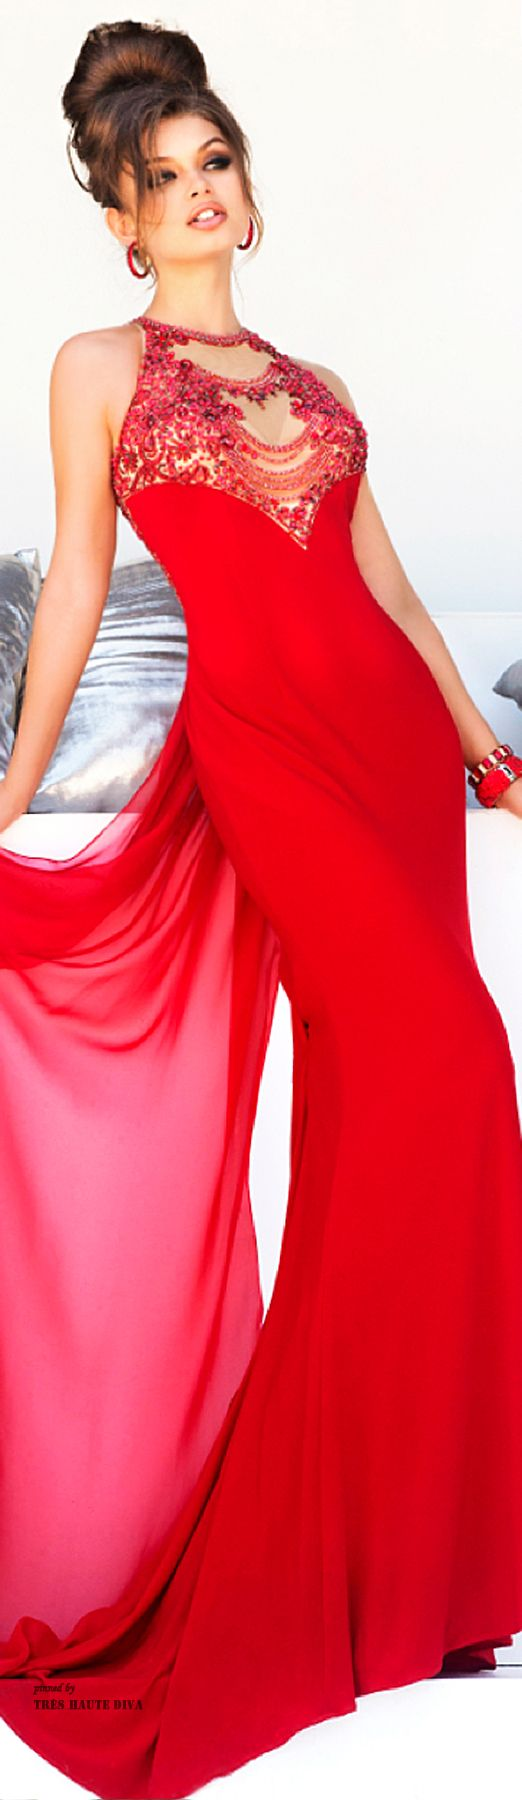 Свадьба - Gowns...Ravishing Reds